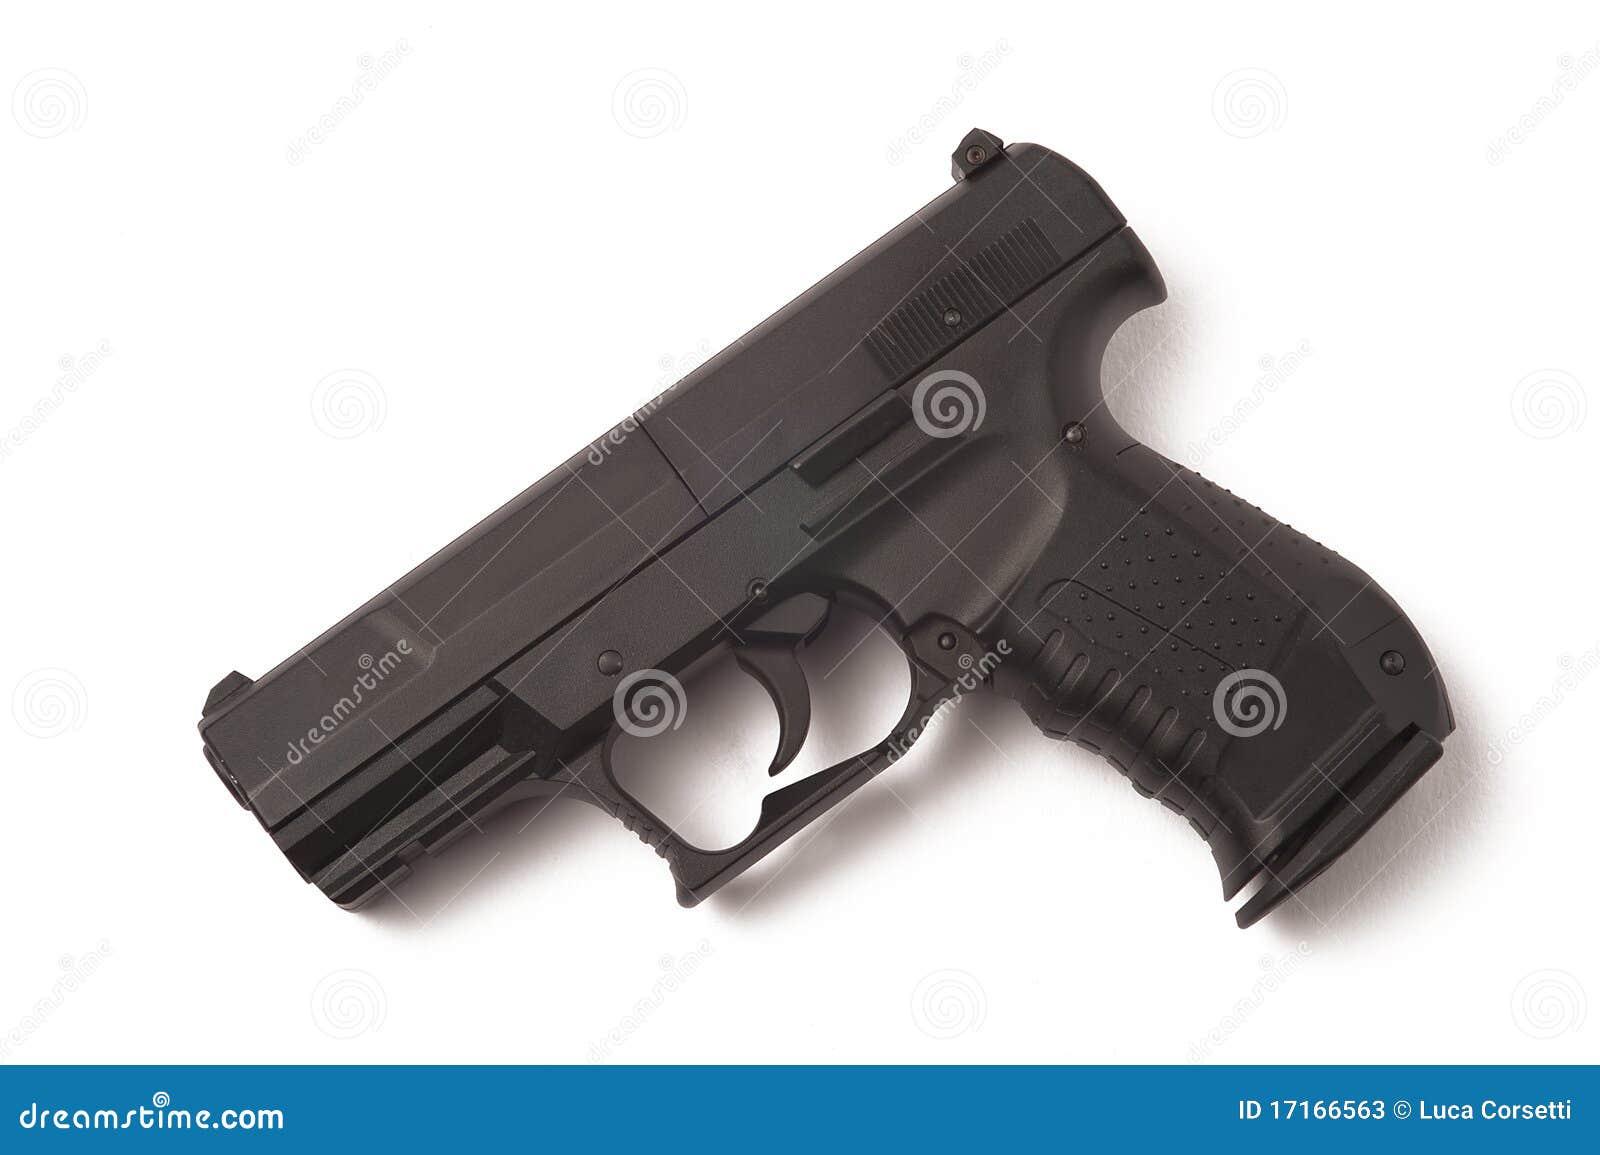 gun white background - photo #8